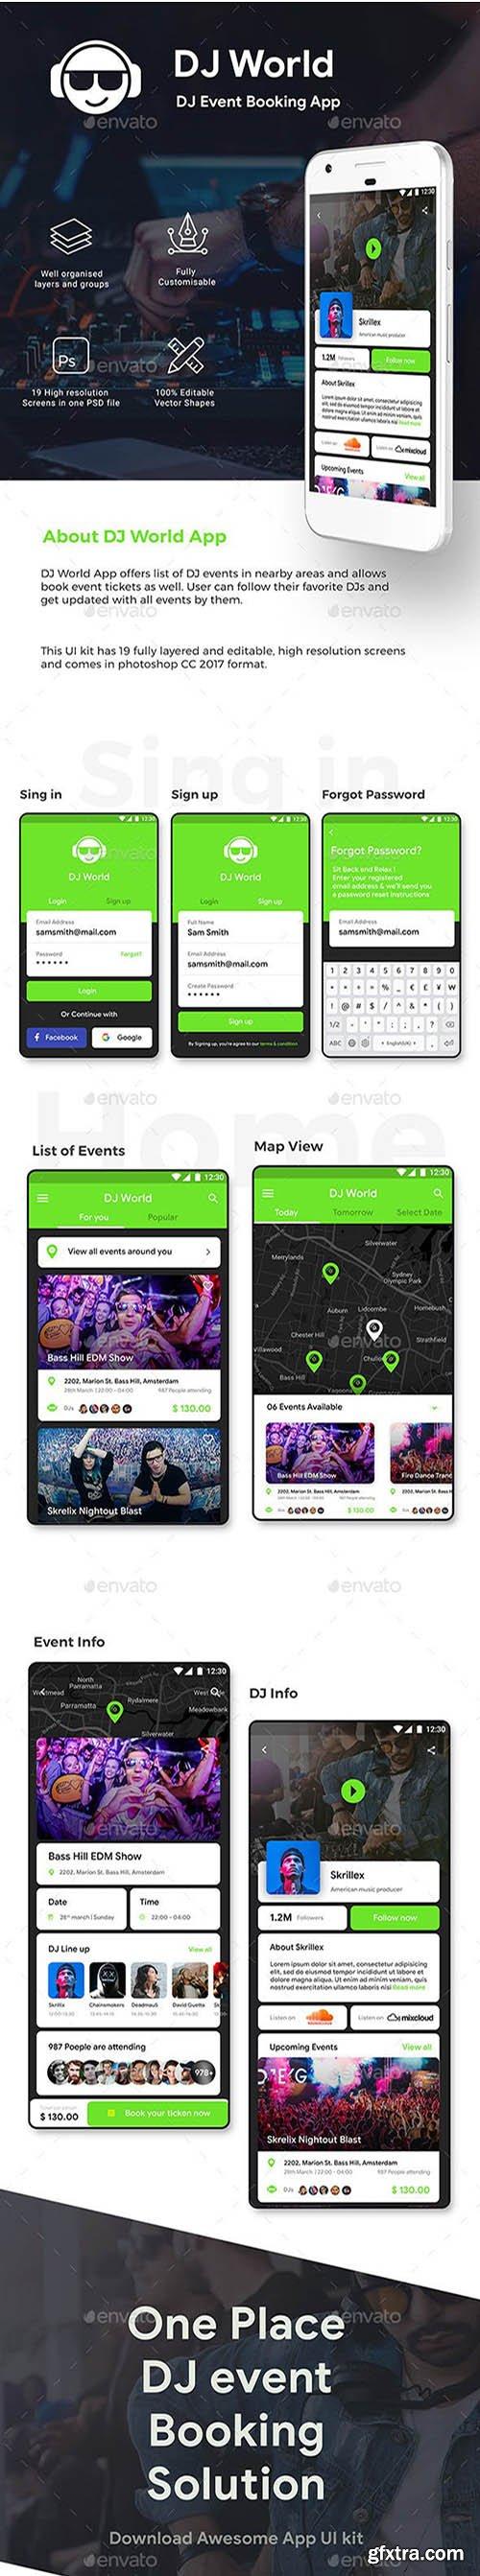 DJ Event Booking App UI Kit | DJ World 23268079